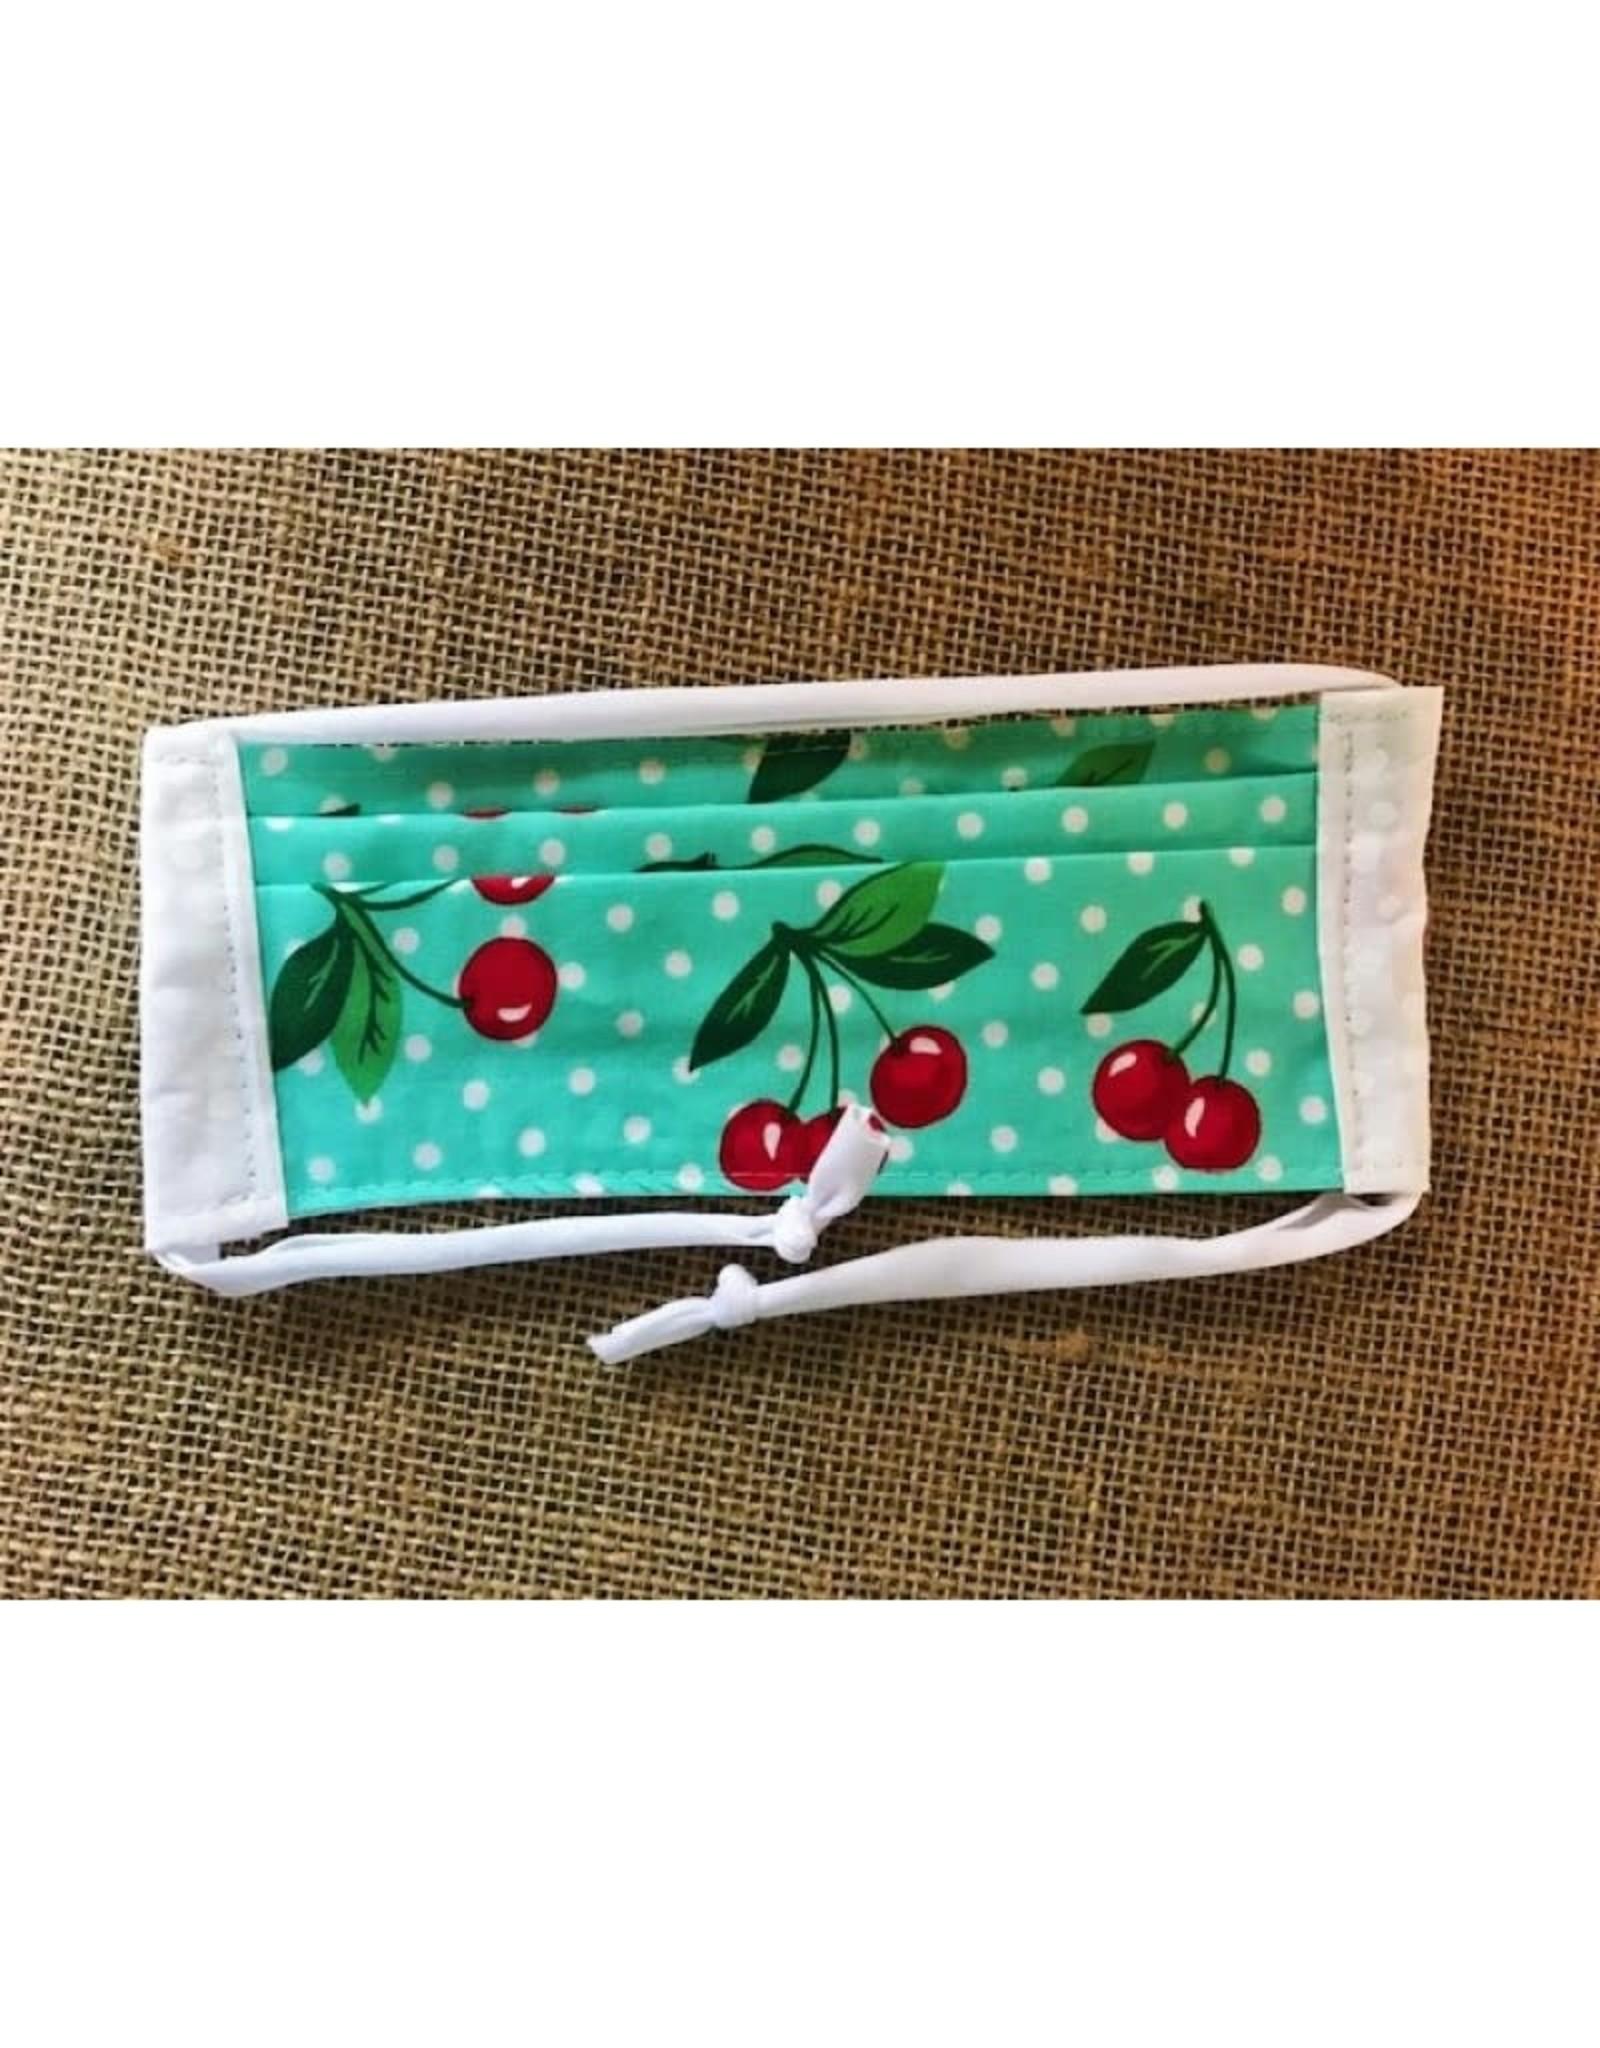 Bear Den Handmade Cotton Mask - Turquoise Cherry